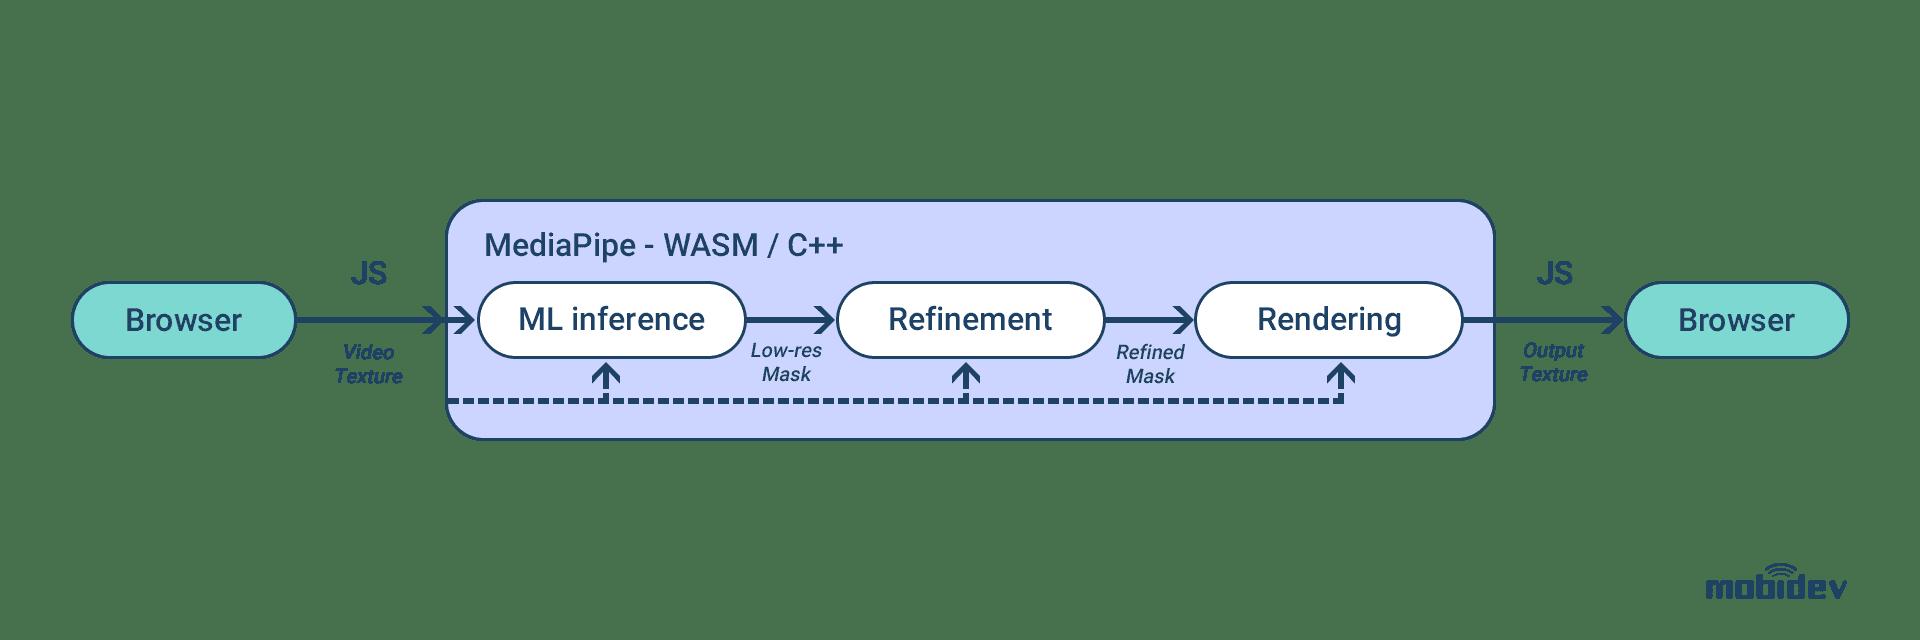 WebML Pipeline